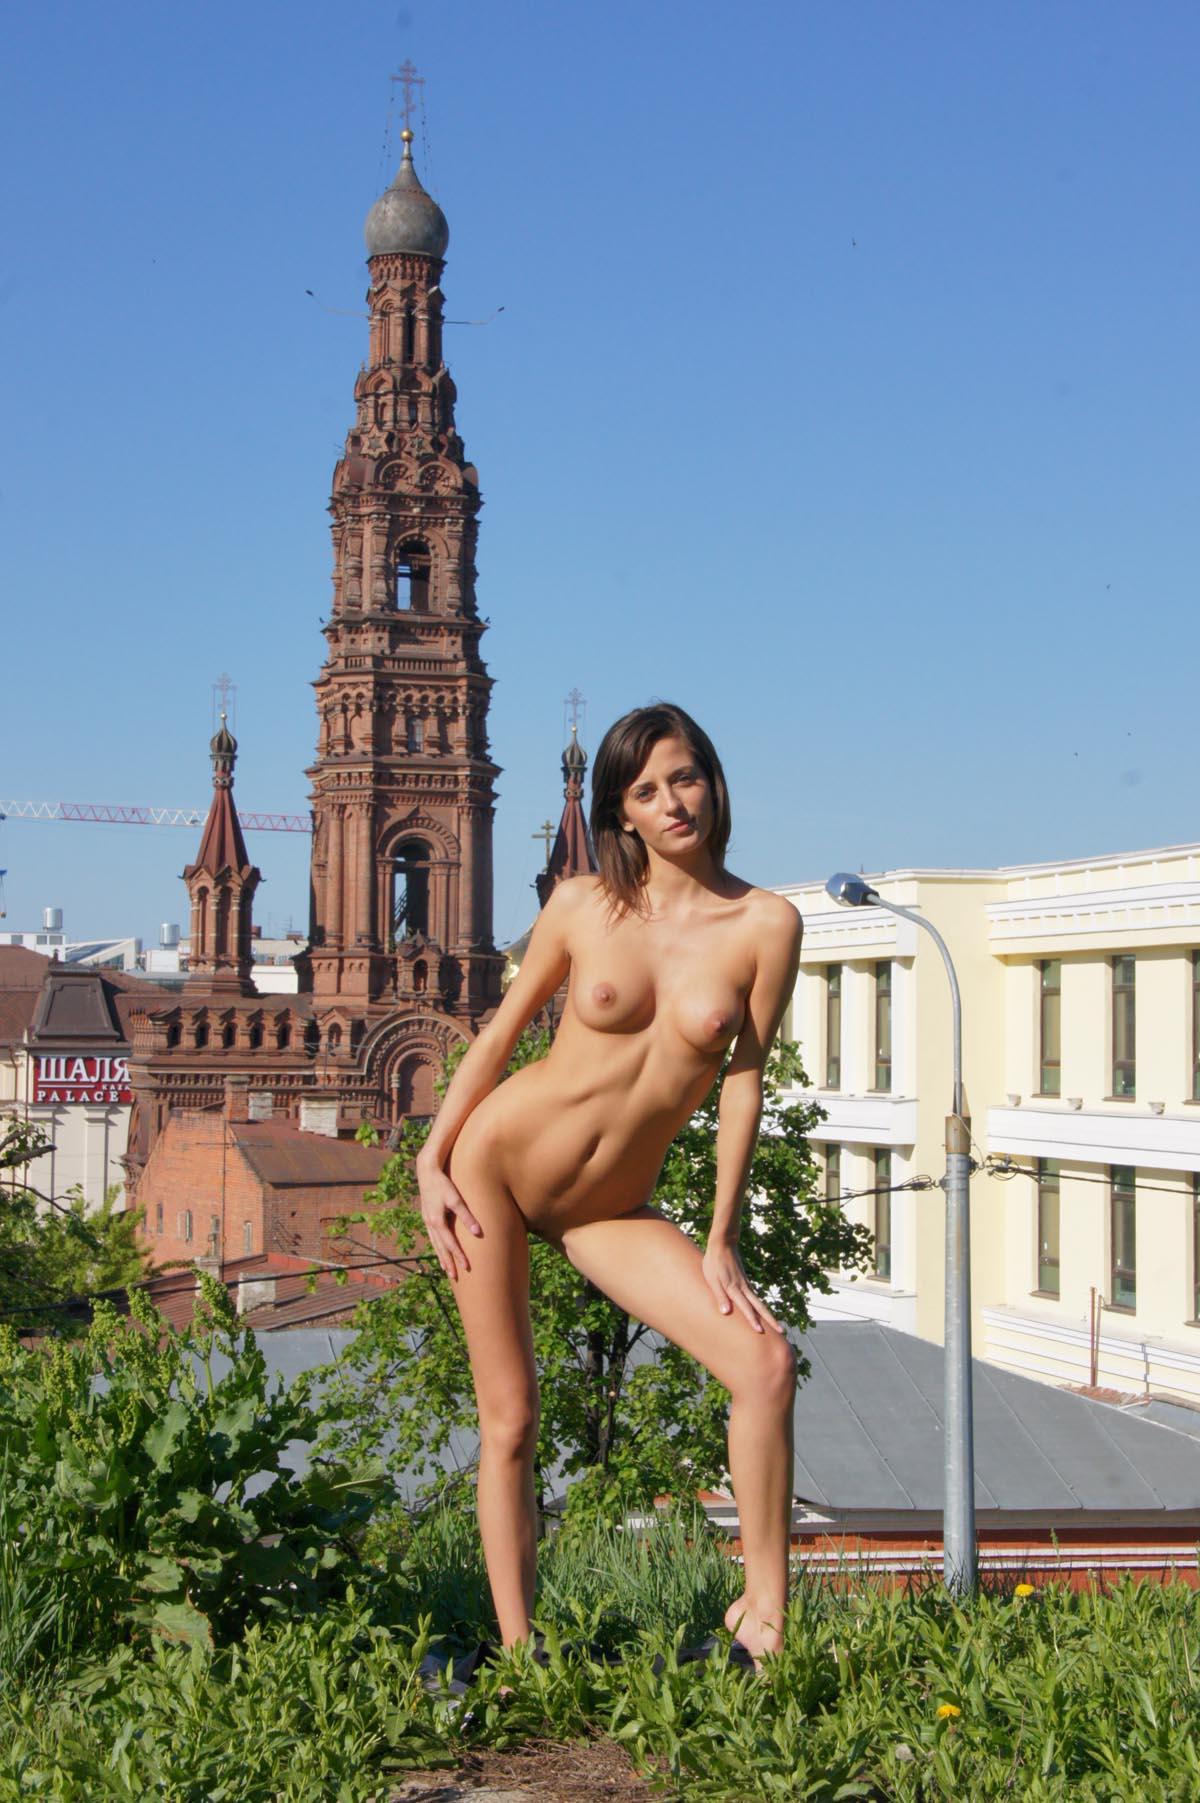 irina-k-naked-in-russia-kazan-nude-public-18